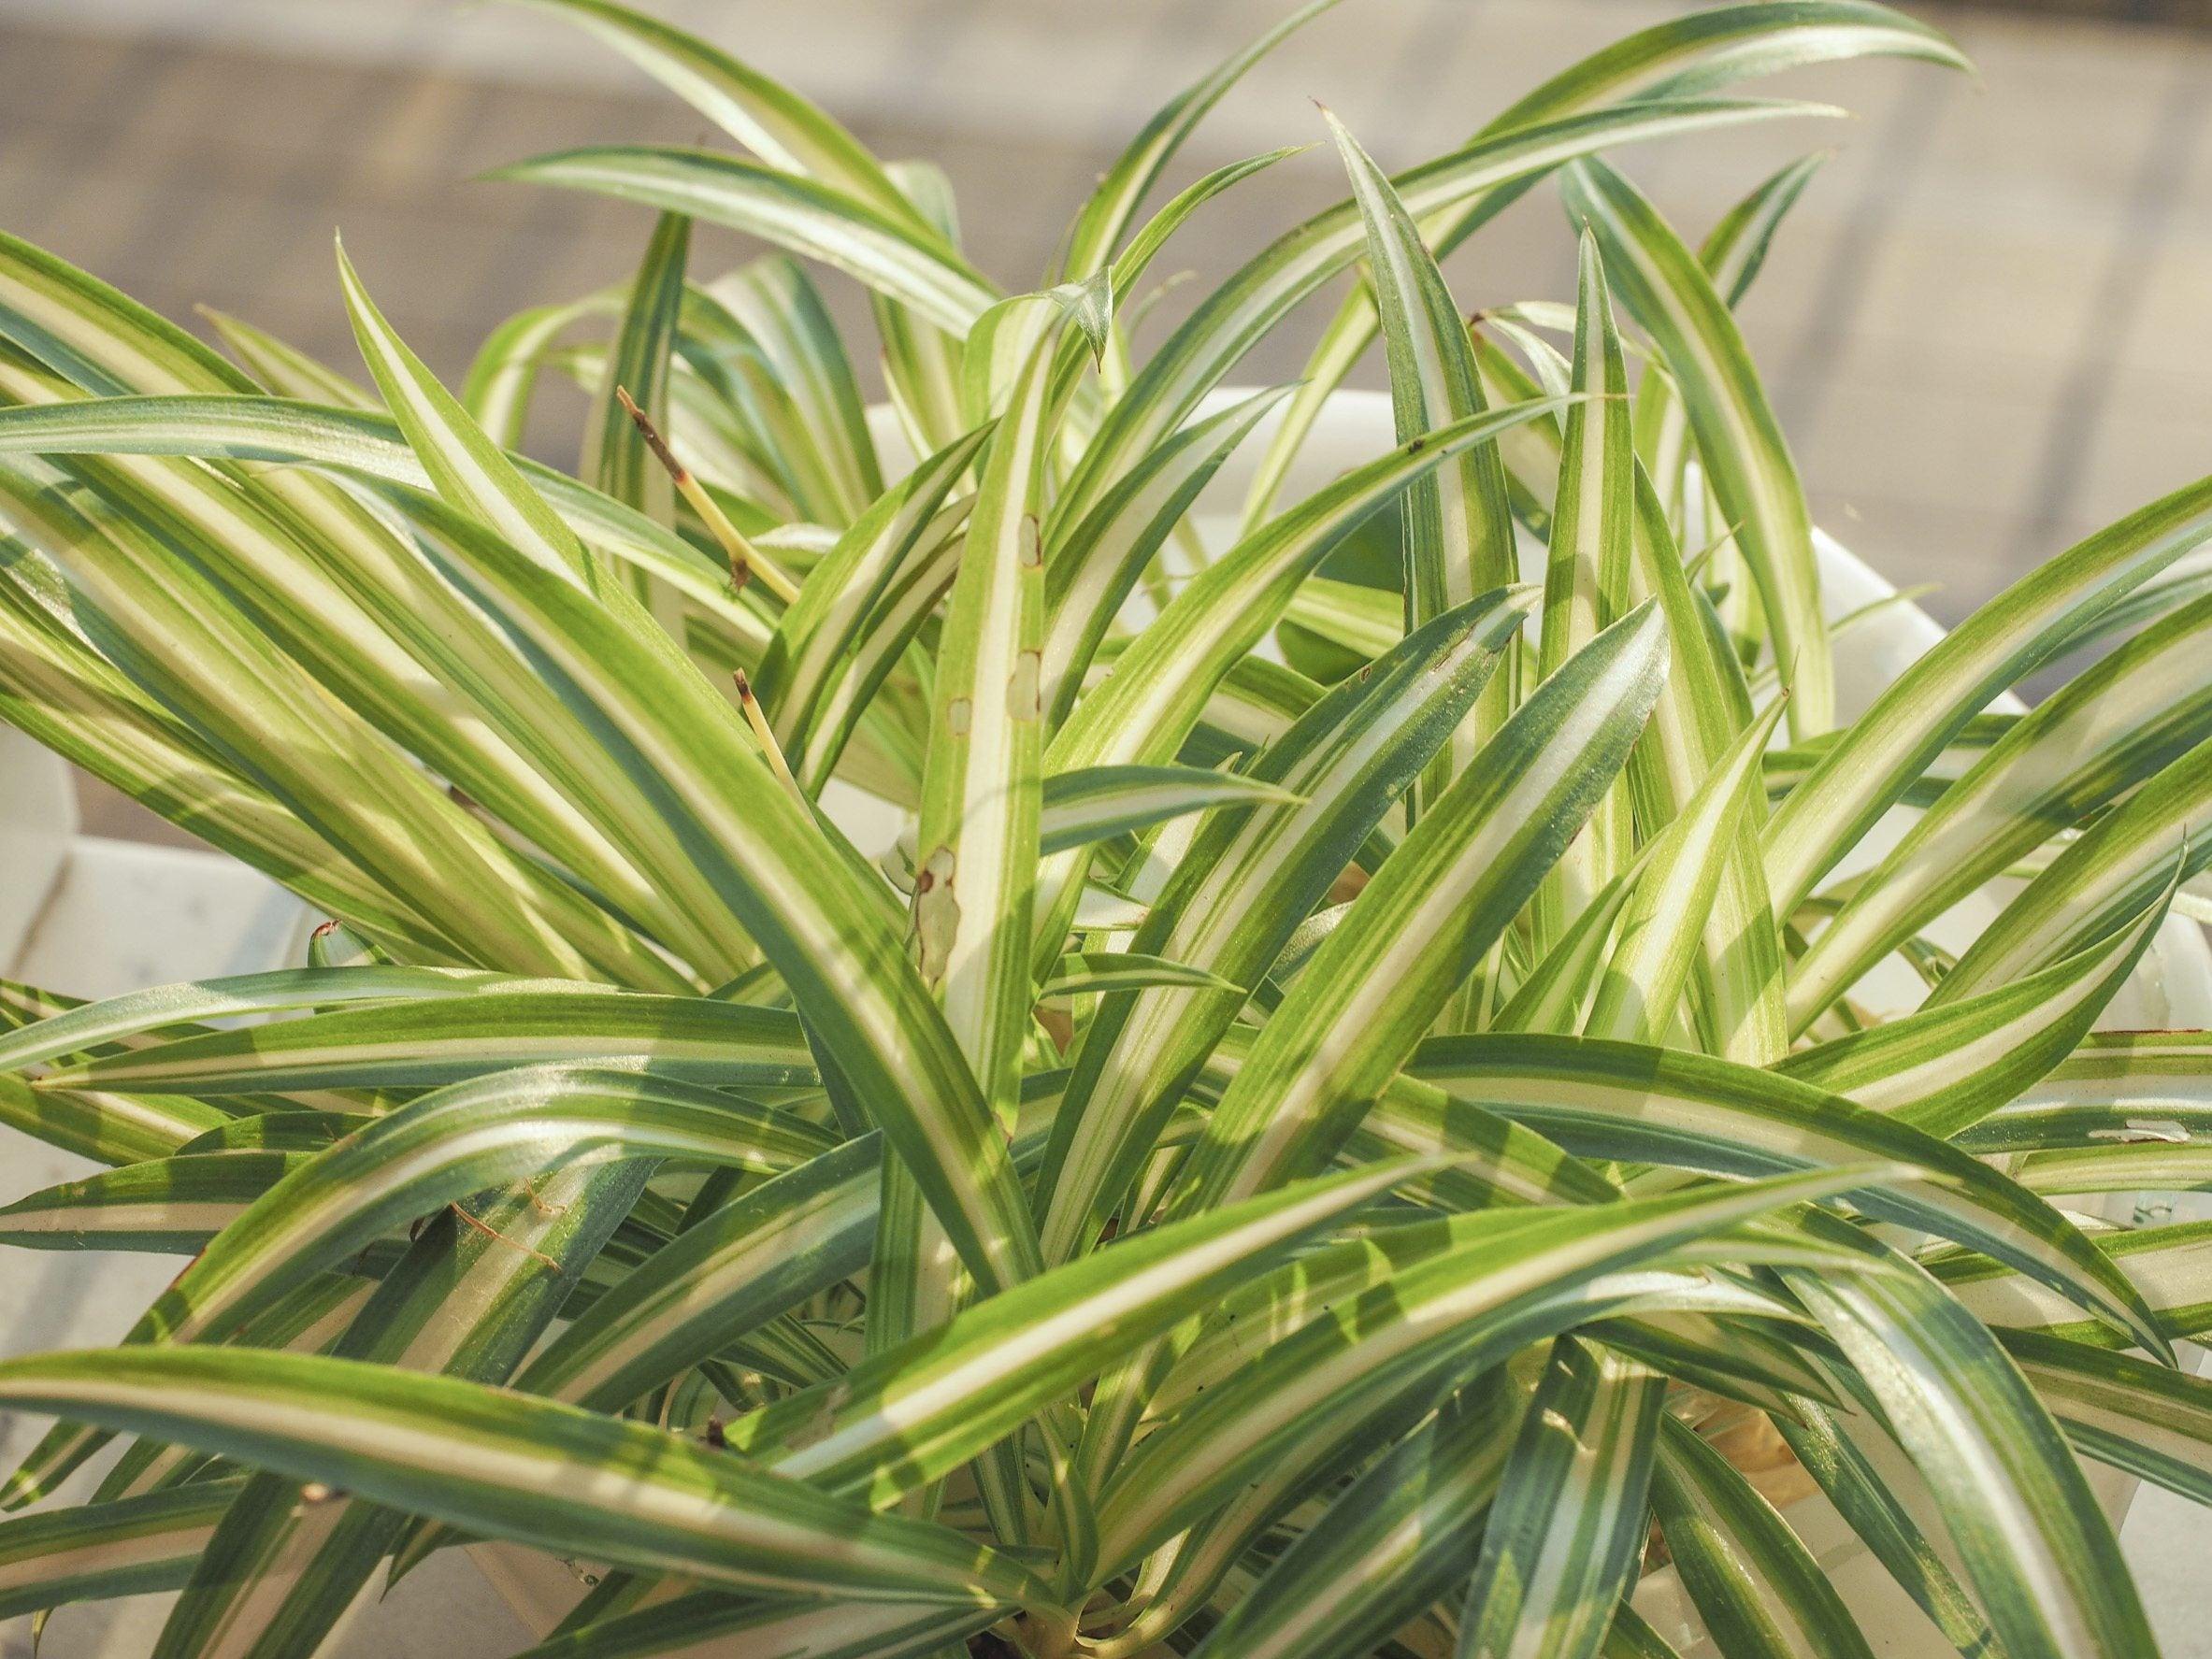 Best Lawn Fertilizer >> Spider Plant Fertilizer: Information On Fertilizing A ...